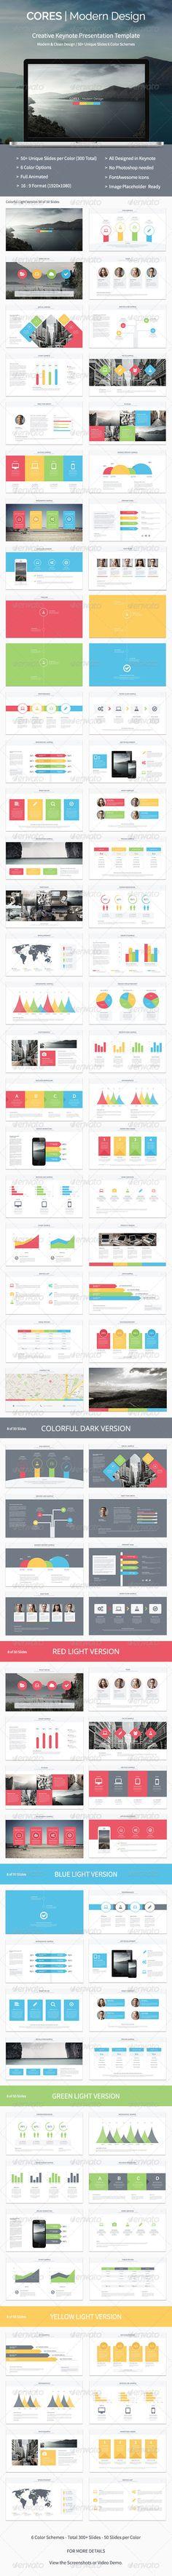 Cores - Keynote Presentation Template